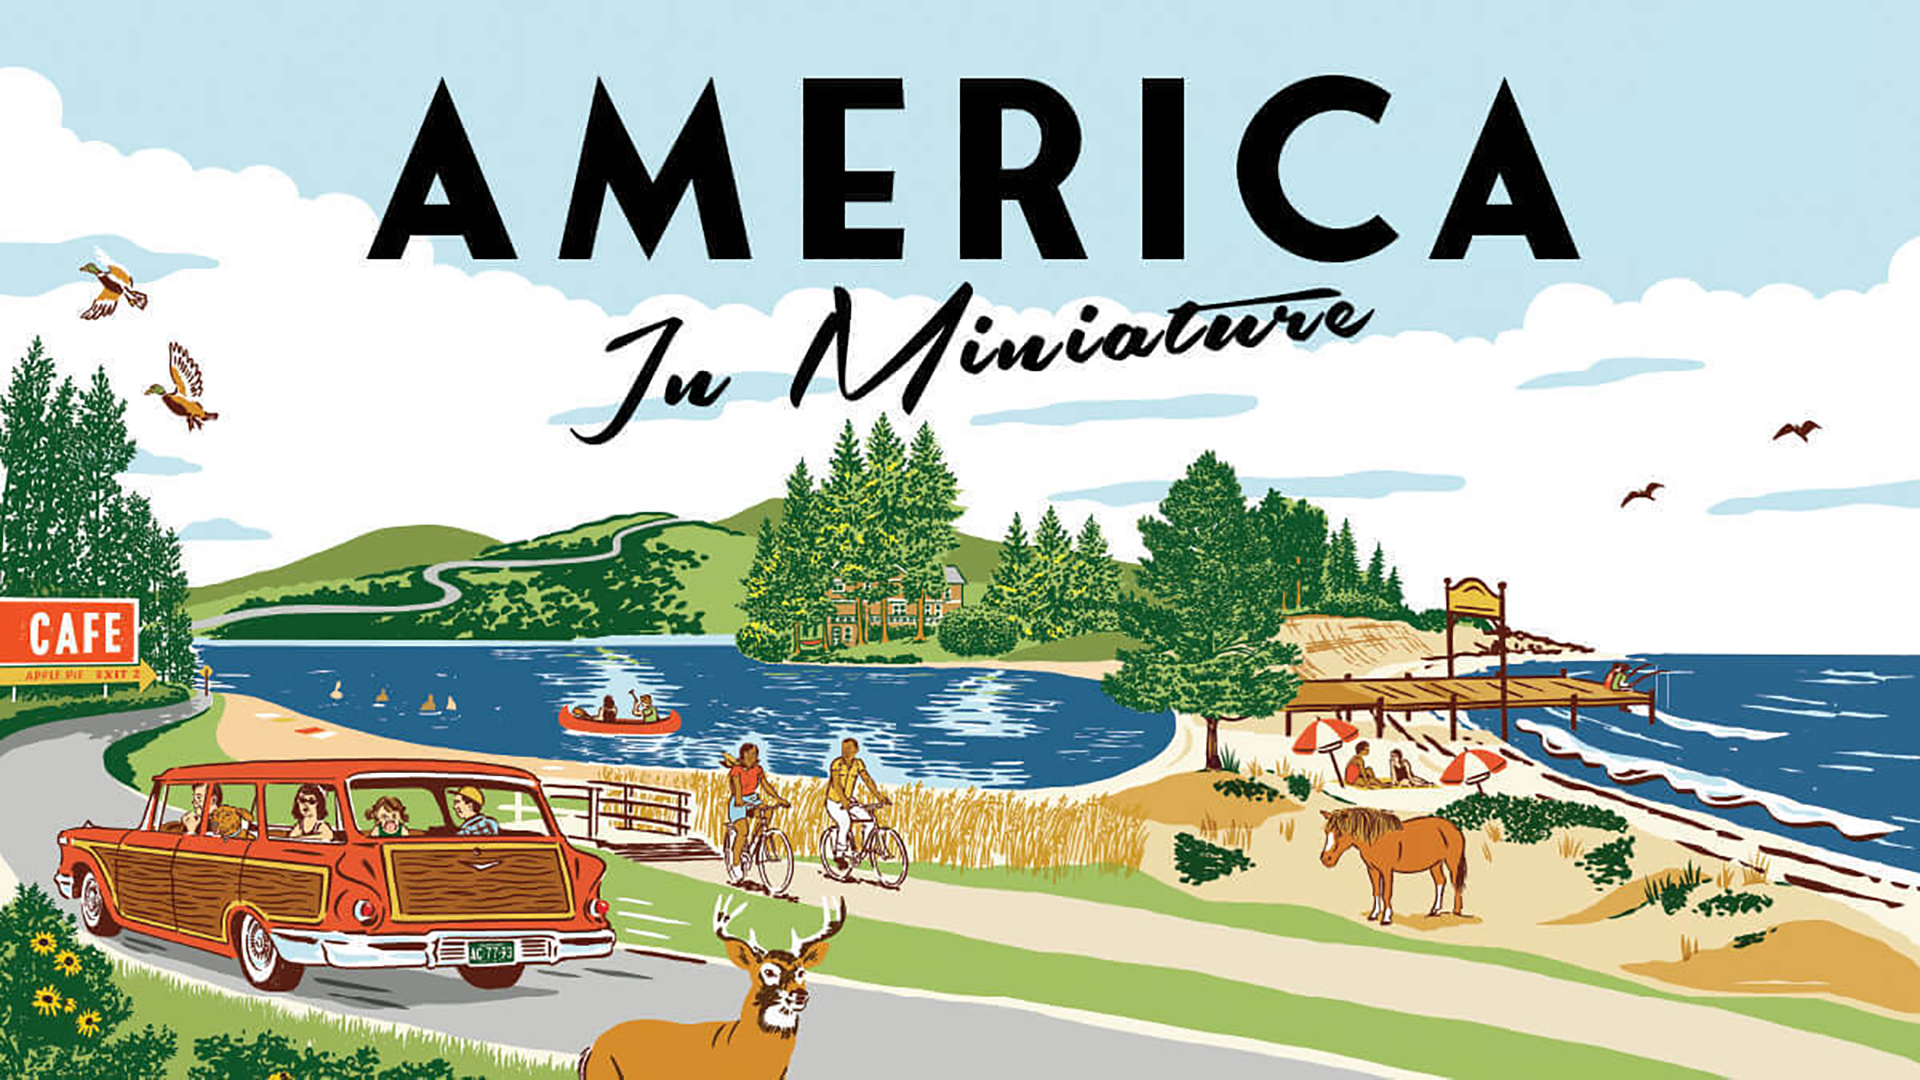 Maryland: America in Miniature